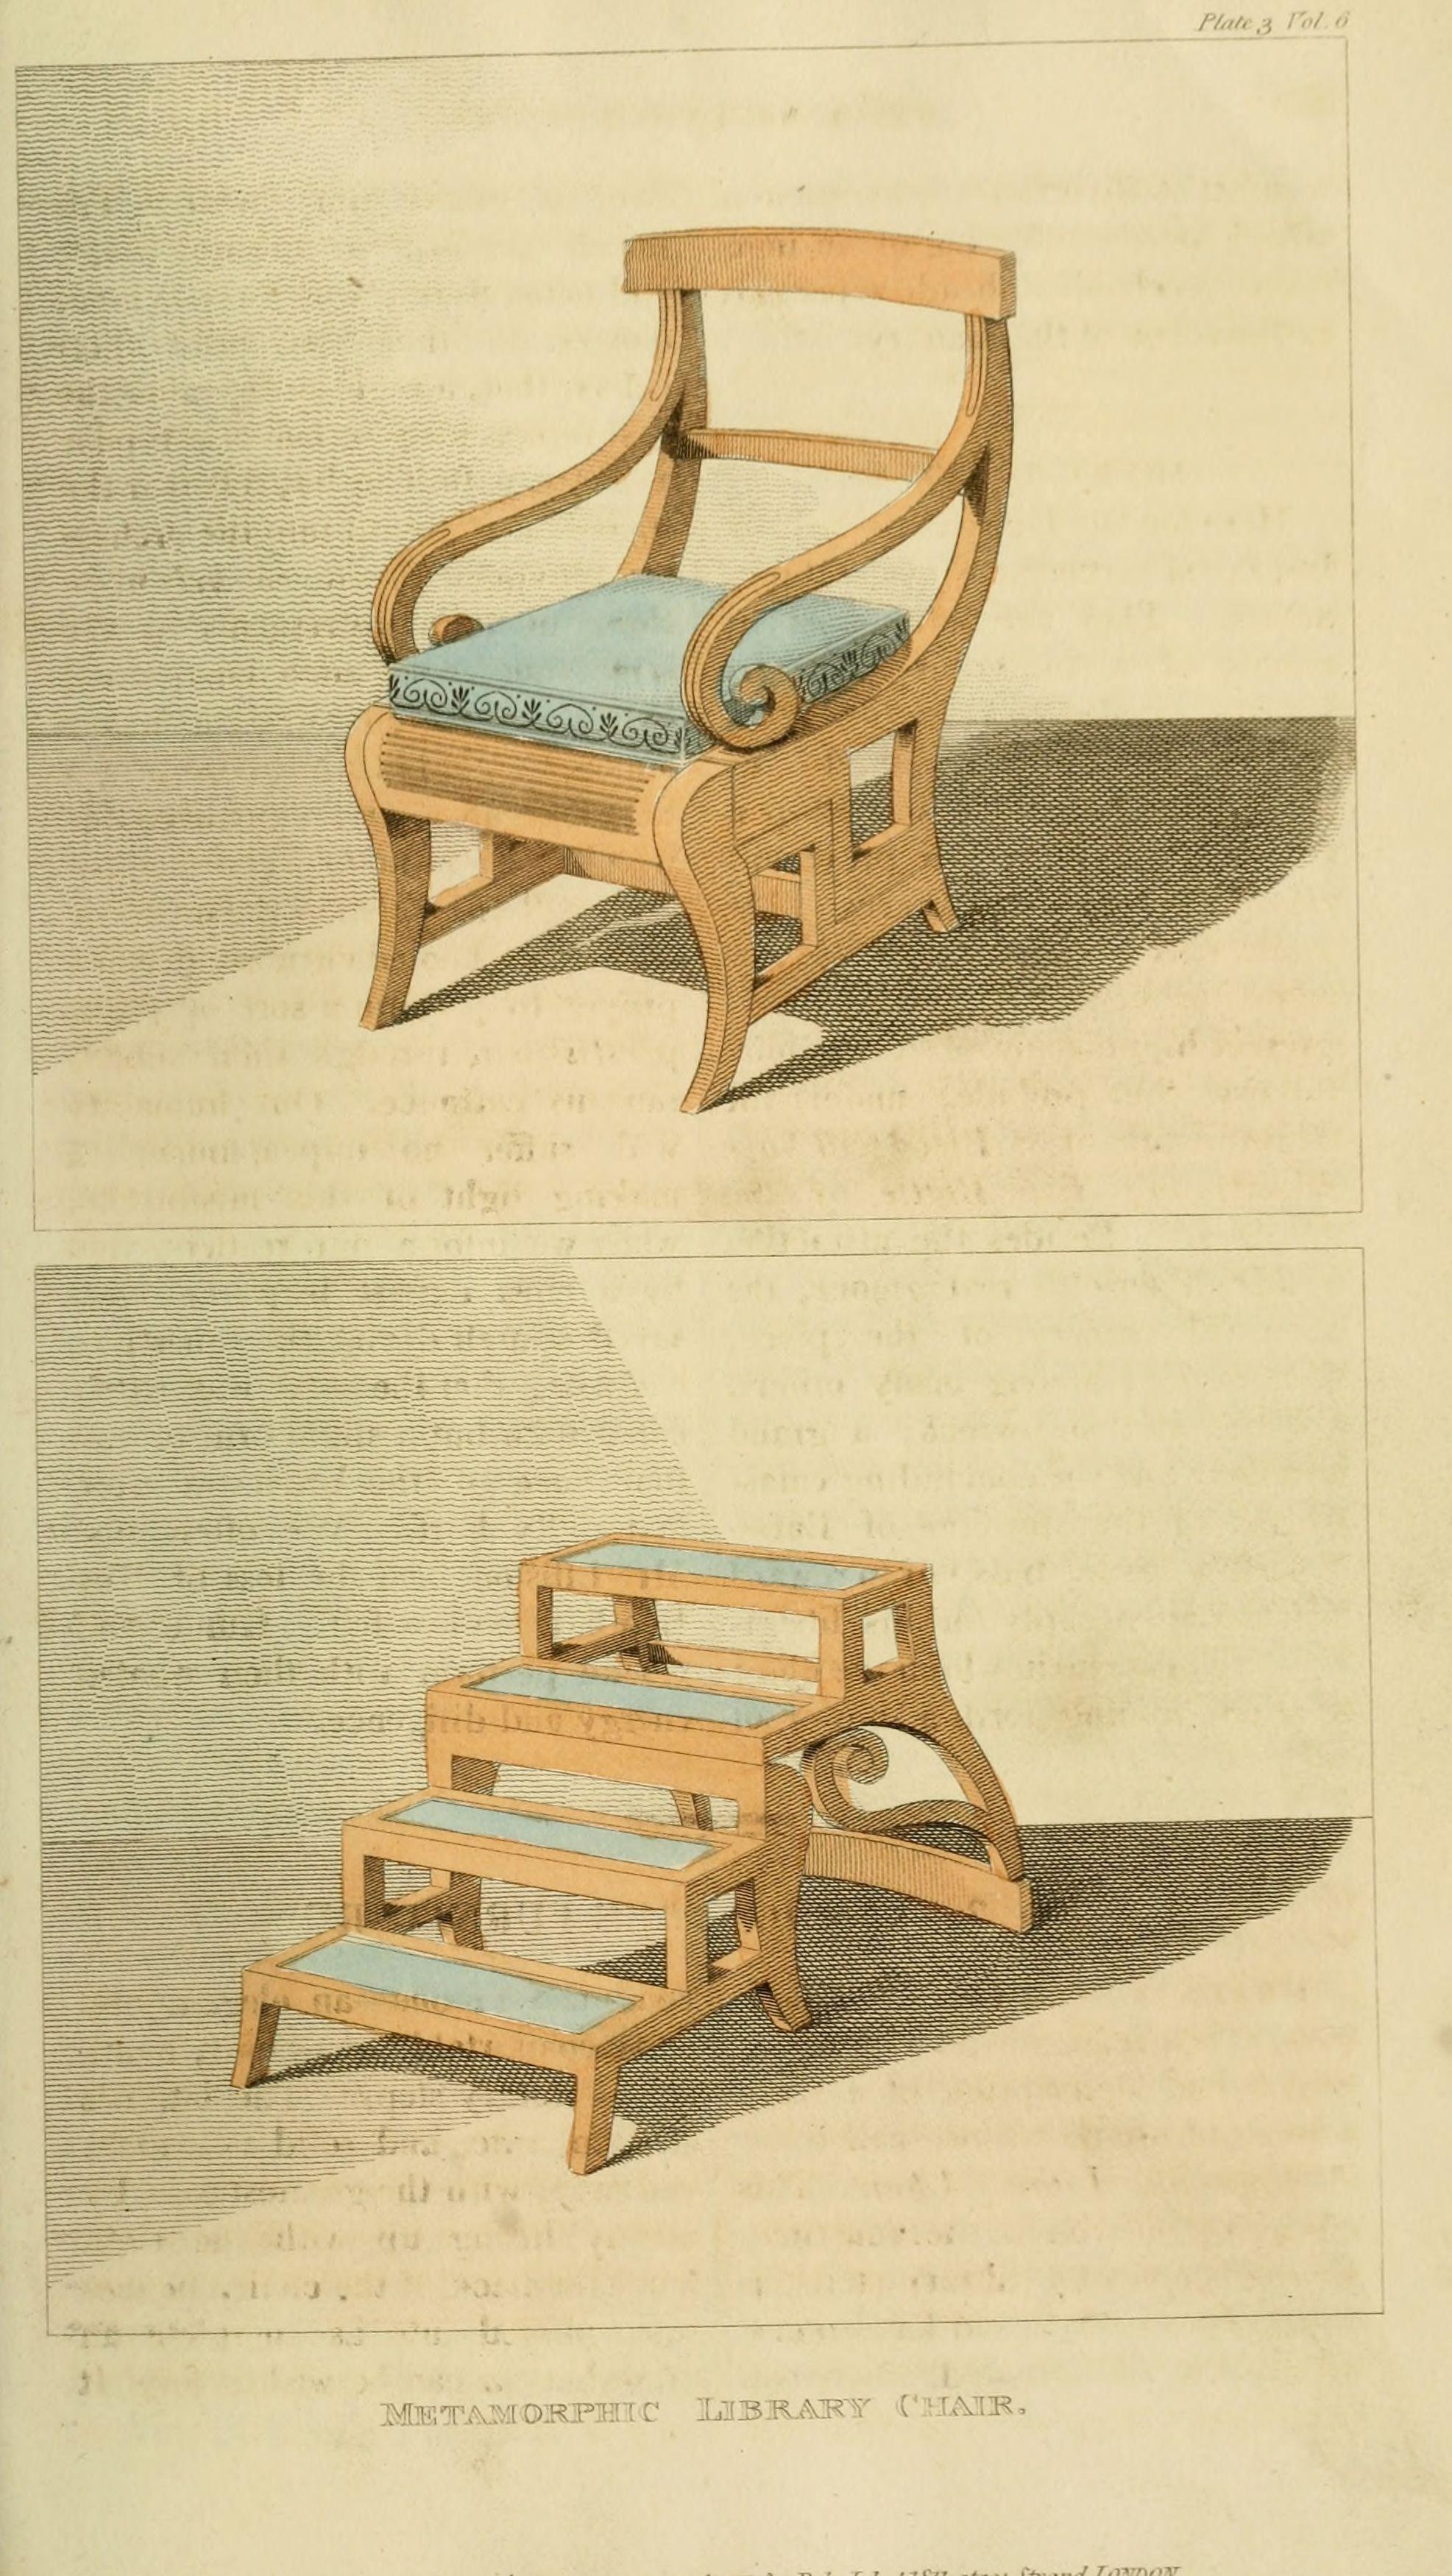 Public Domain Images Vintage Furniture Design Inspiration Circa